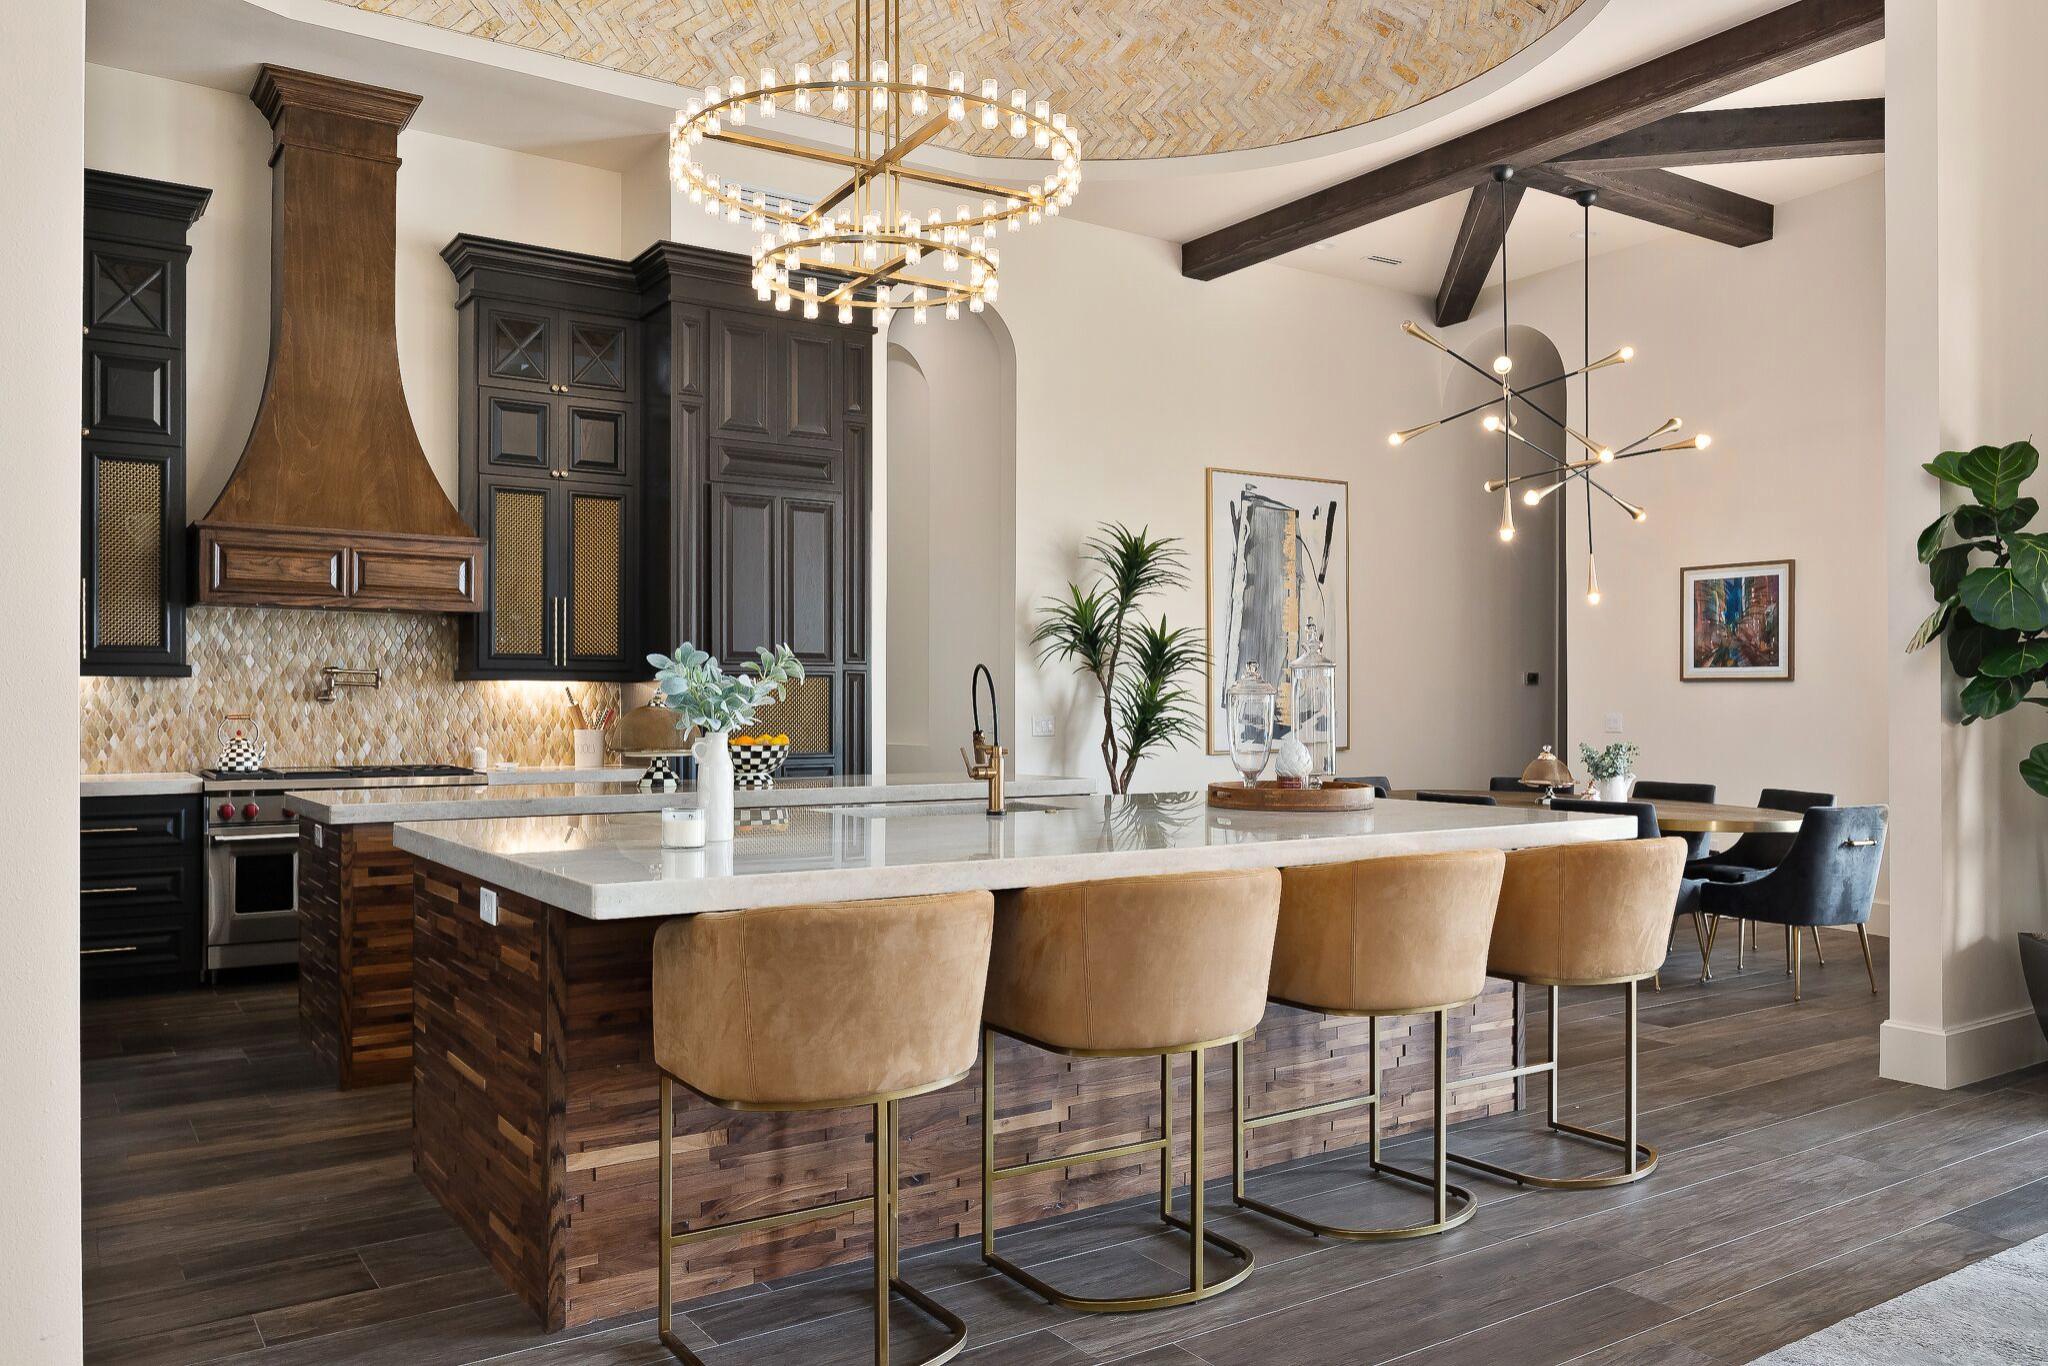 75 Beautiful Kitchen With Mosaic Tile Backsplash Pictures Ideas December 2020 Houzz